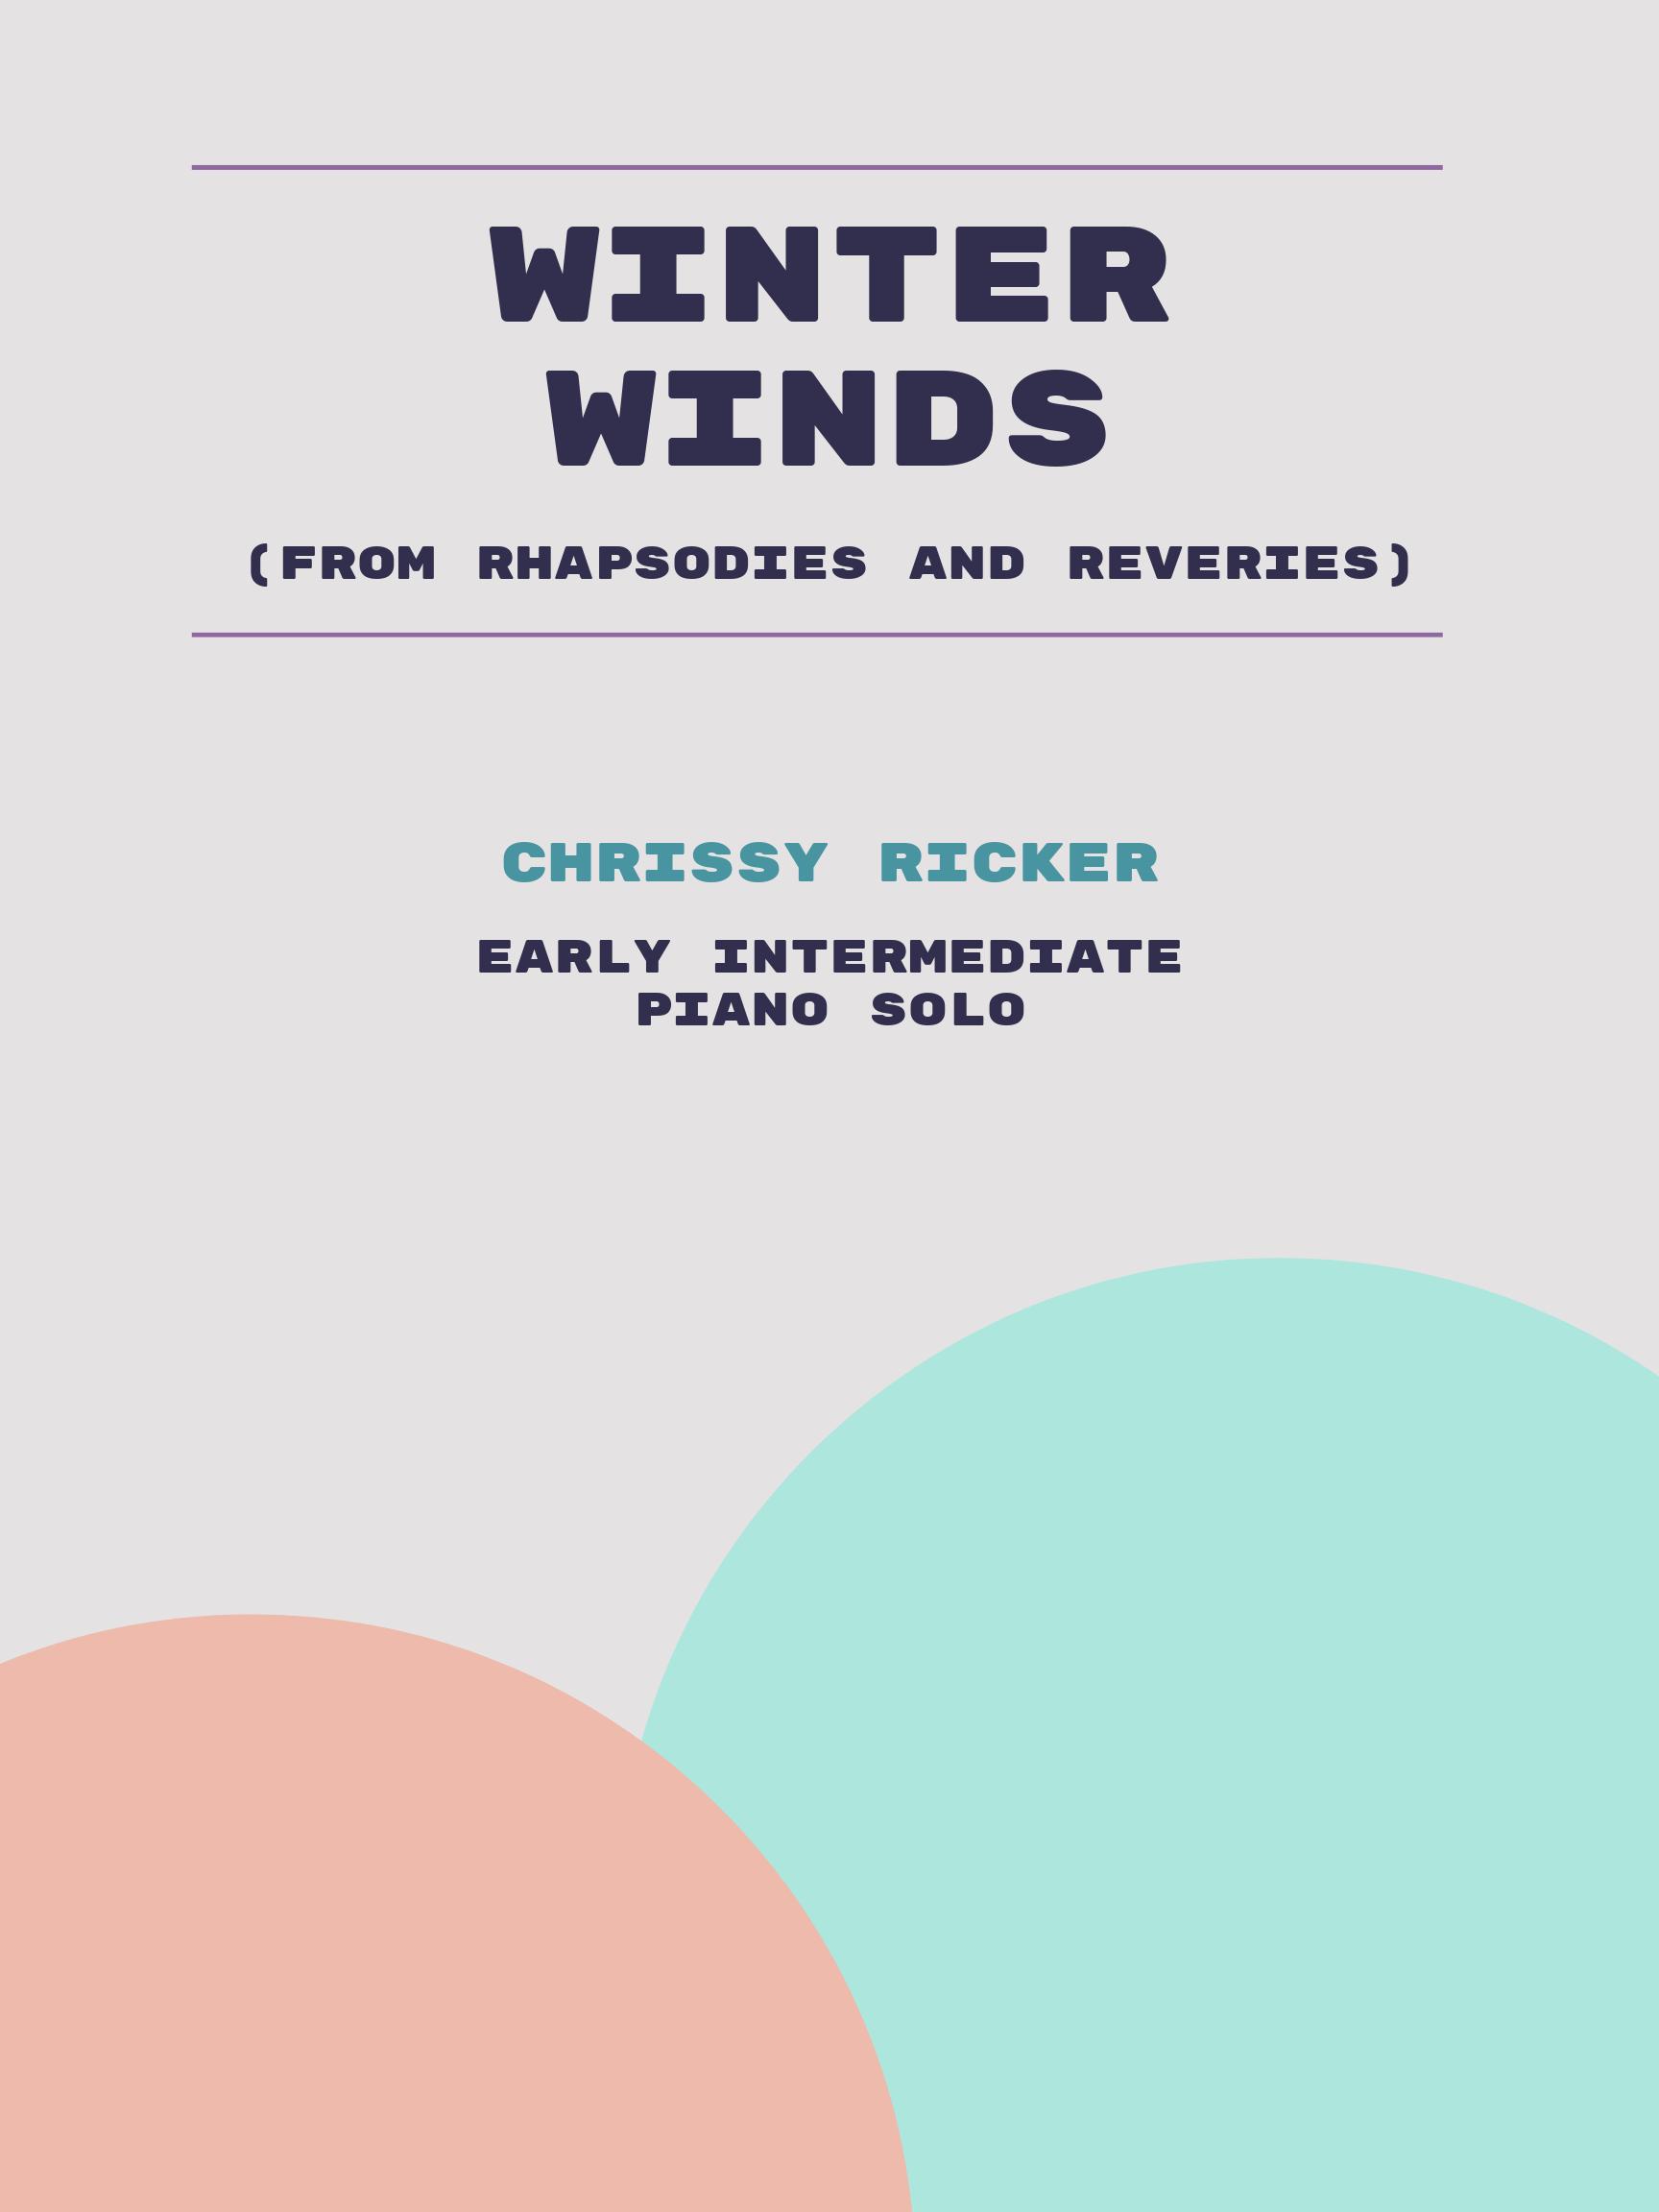 Winter Winds by Chrissy Ricker